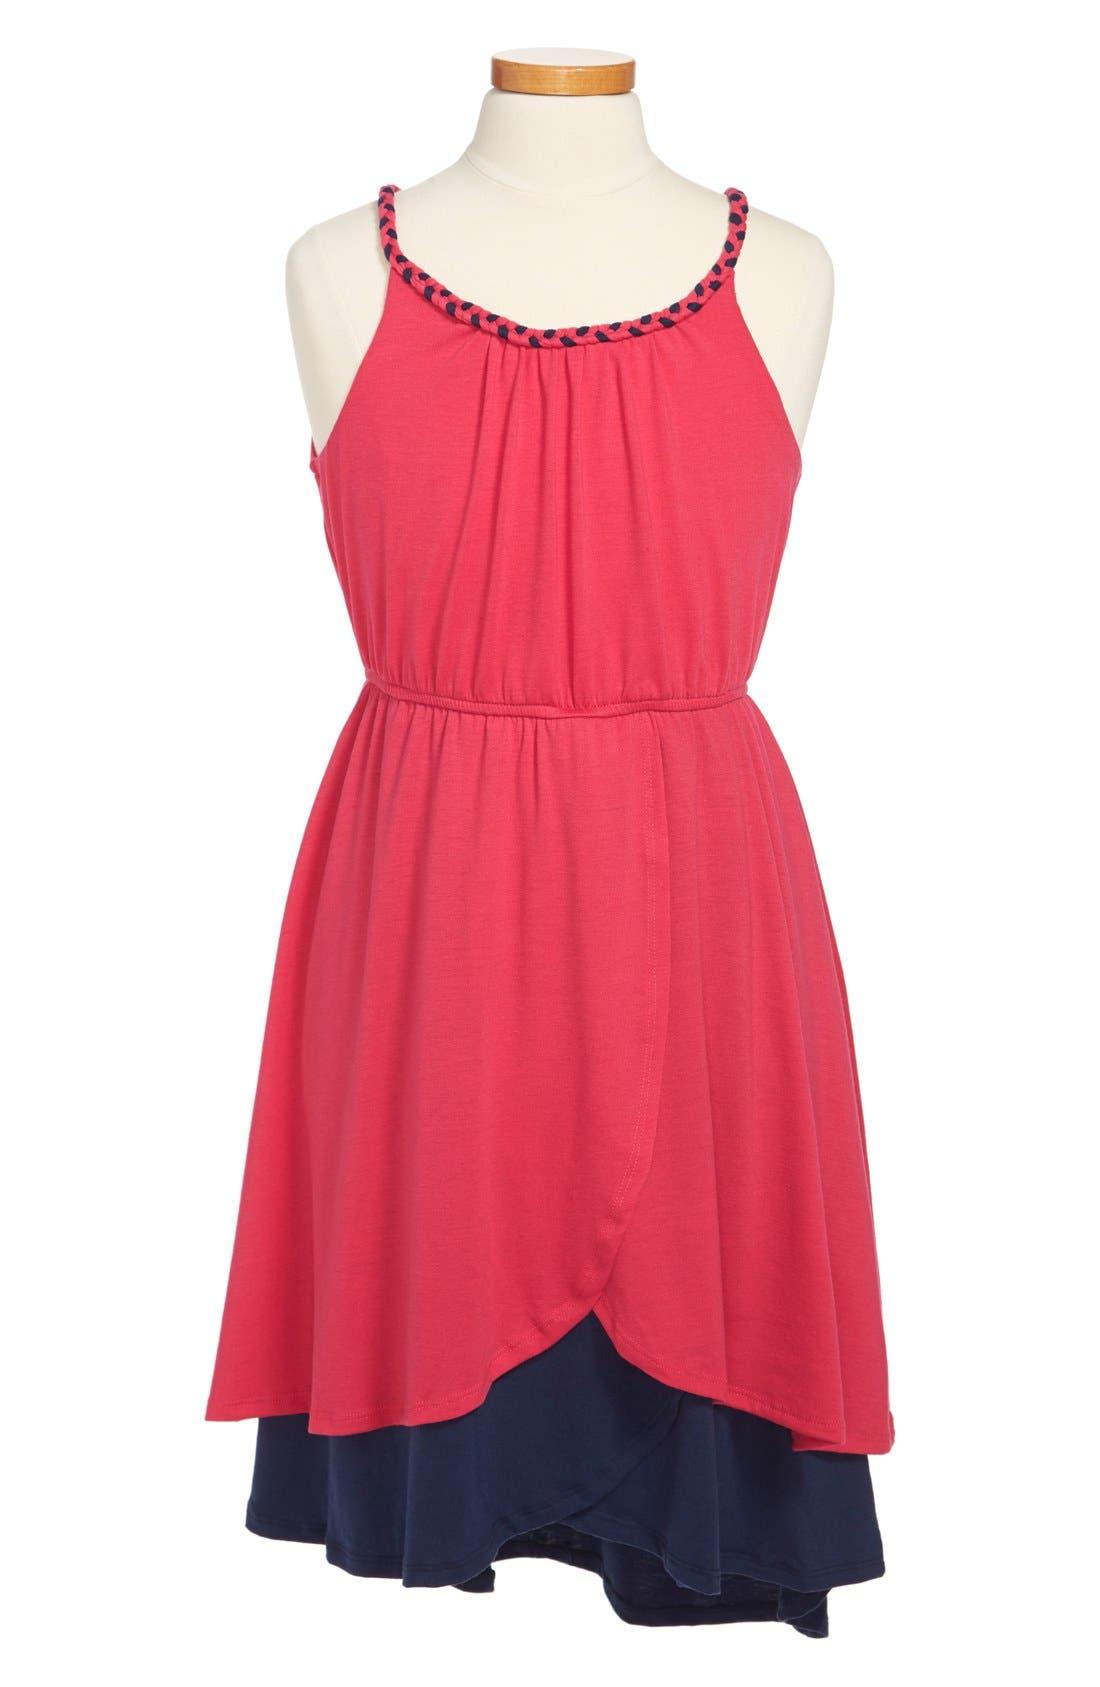 Alternate Image 1 Selected - Paper Doll Colorblock Tulip Skirt Dress (Little Girls & Big Girls)